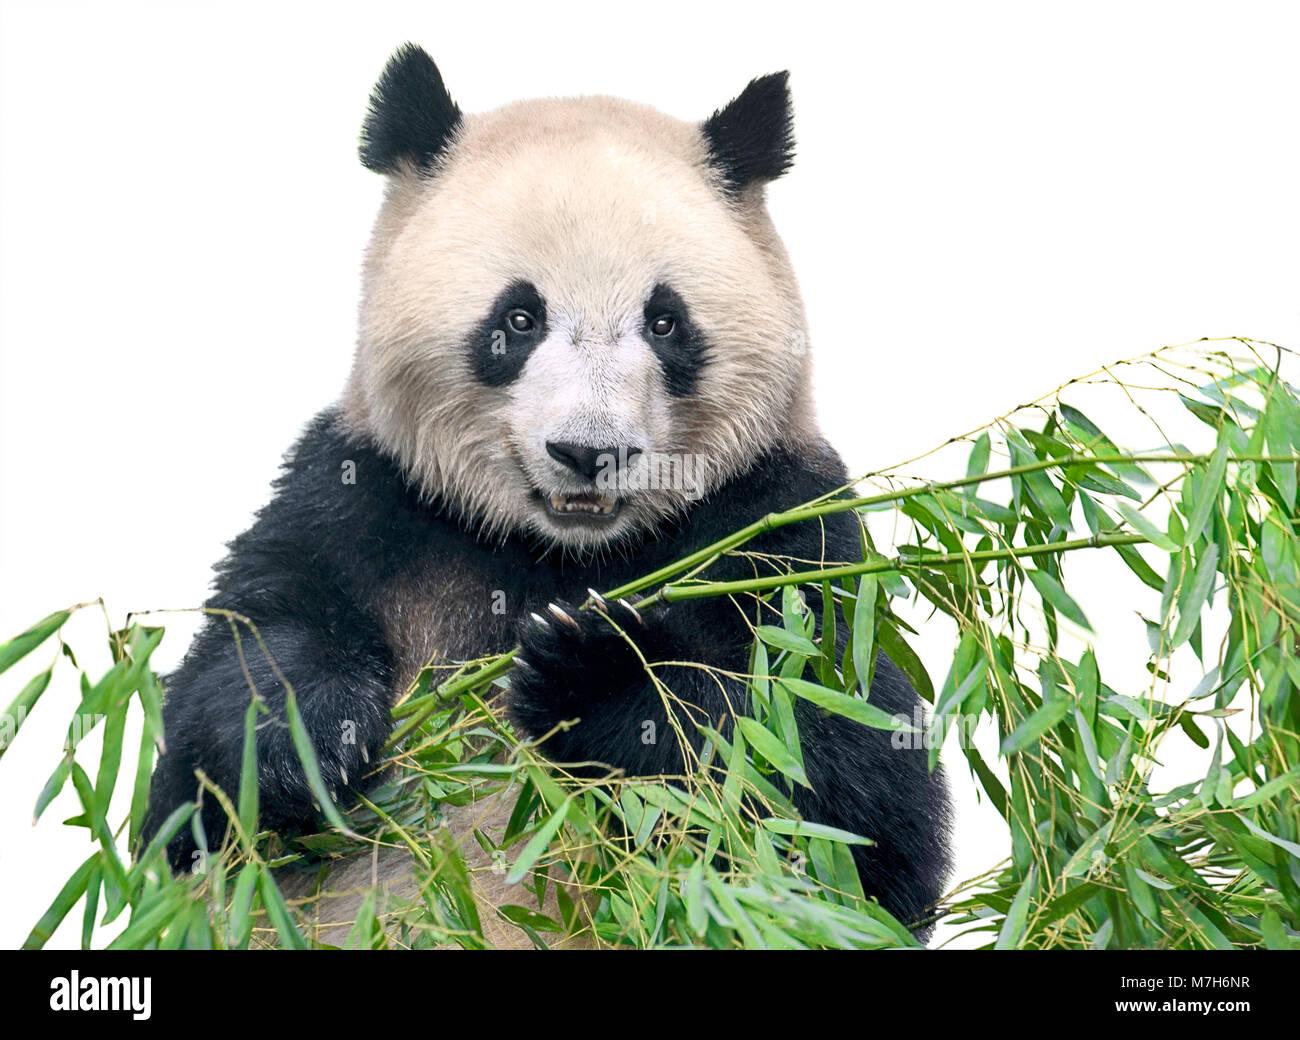 Big Panda, or Bamboo Bear: a description of where interesting facts live 32